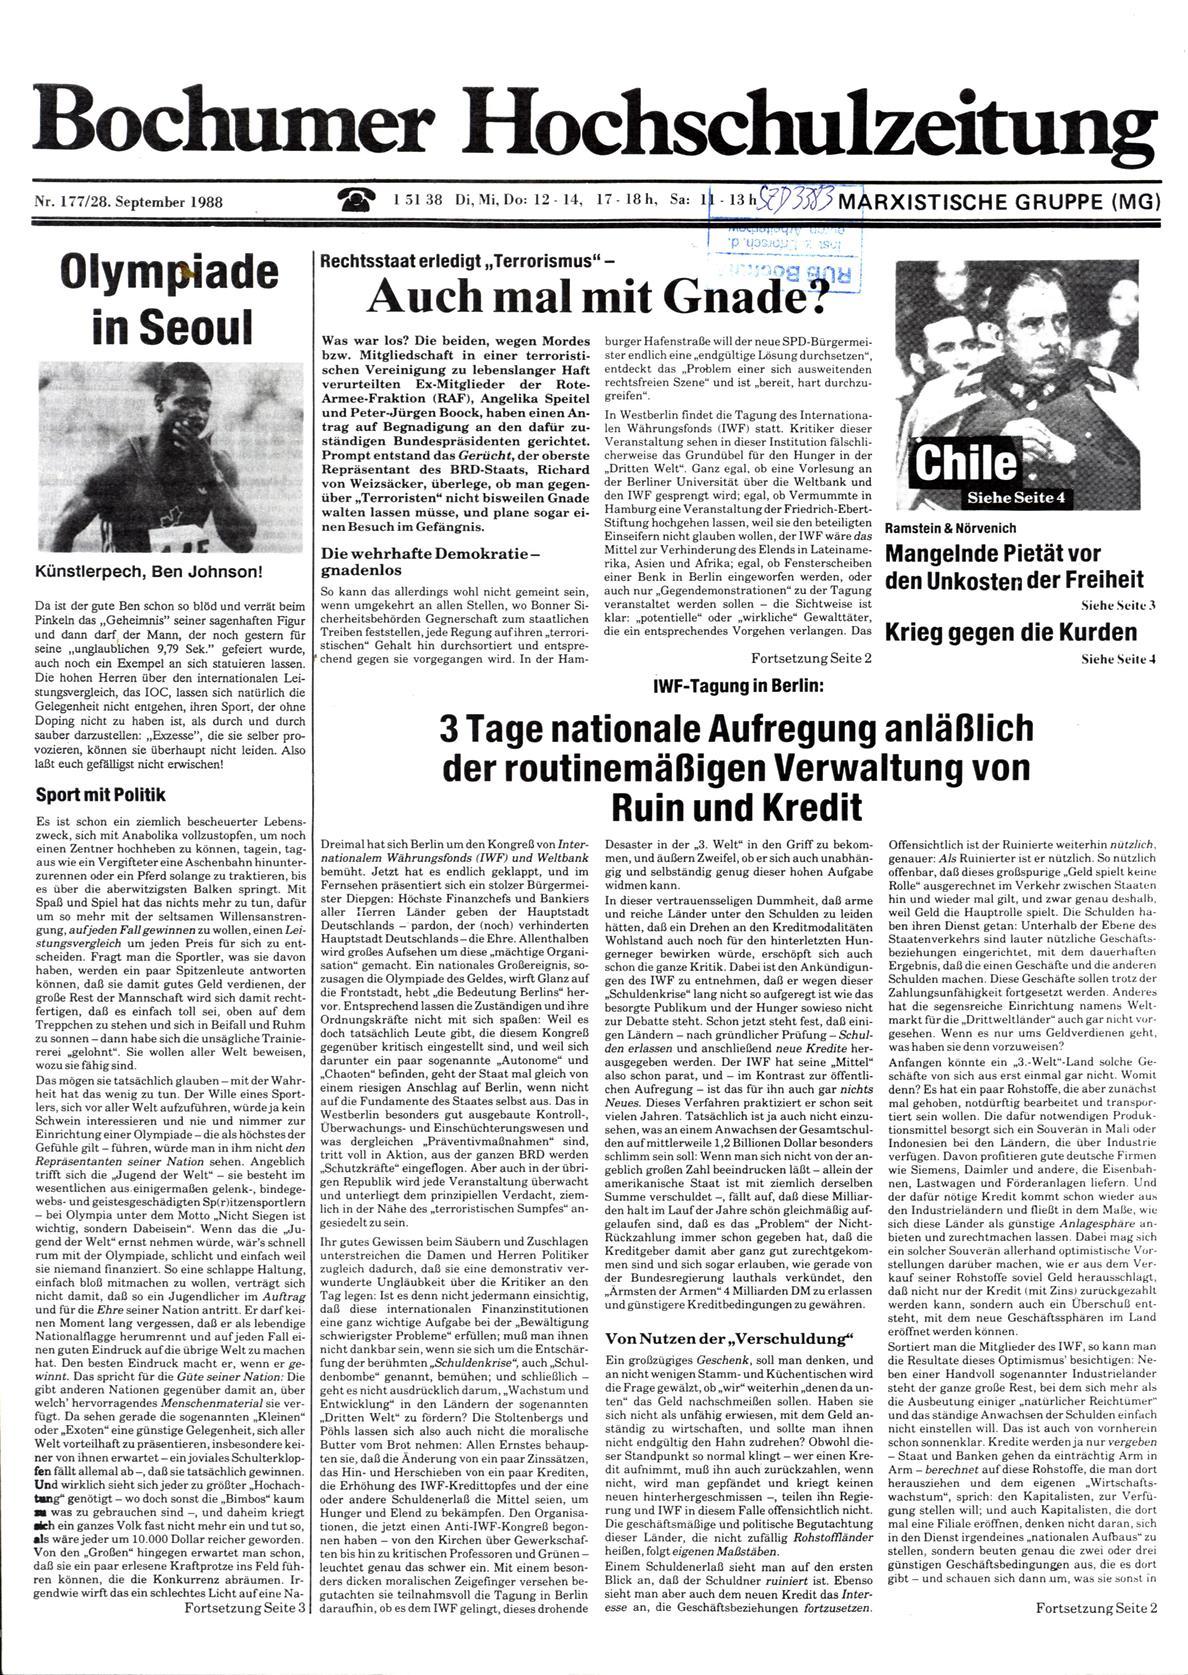 Bochum_BHZ_19880928_177_001